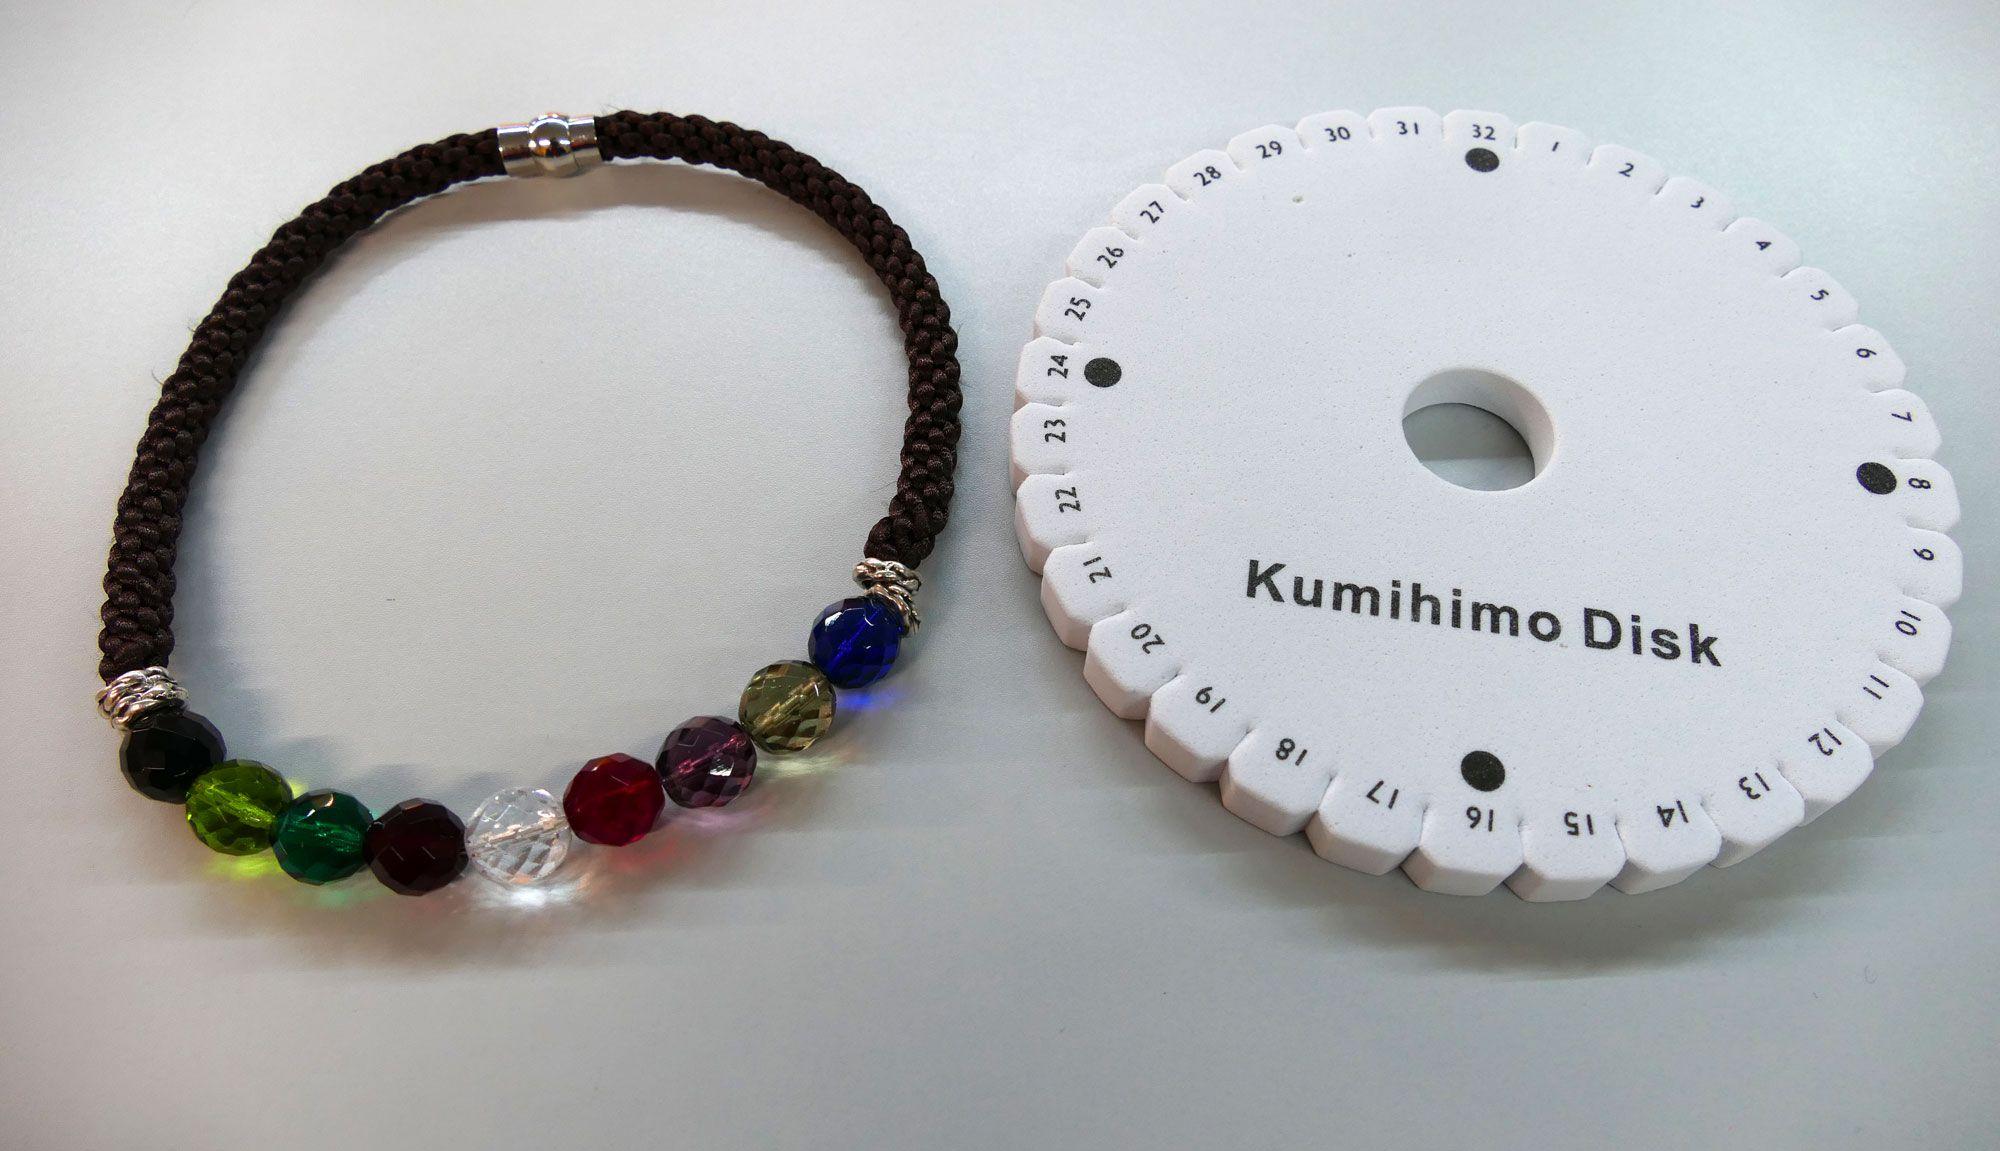 308aa2f44299 Collar Kumihimo con cuentas de cristal - Hogarmania